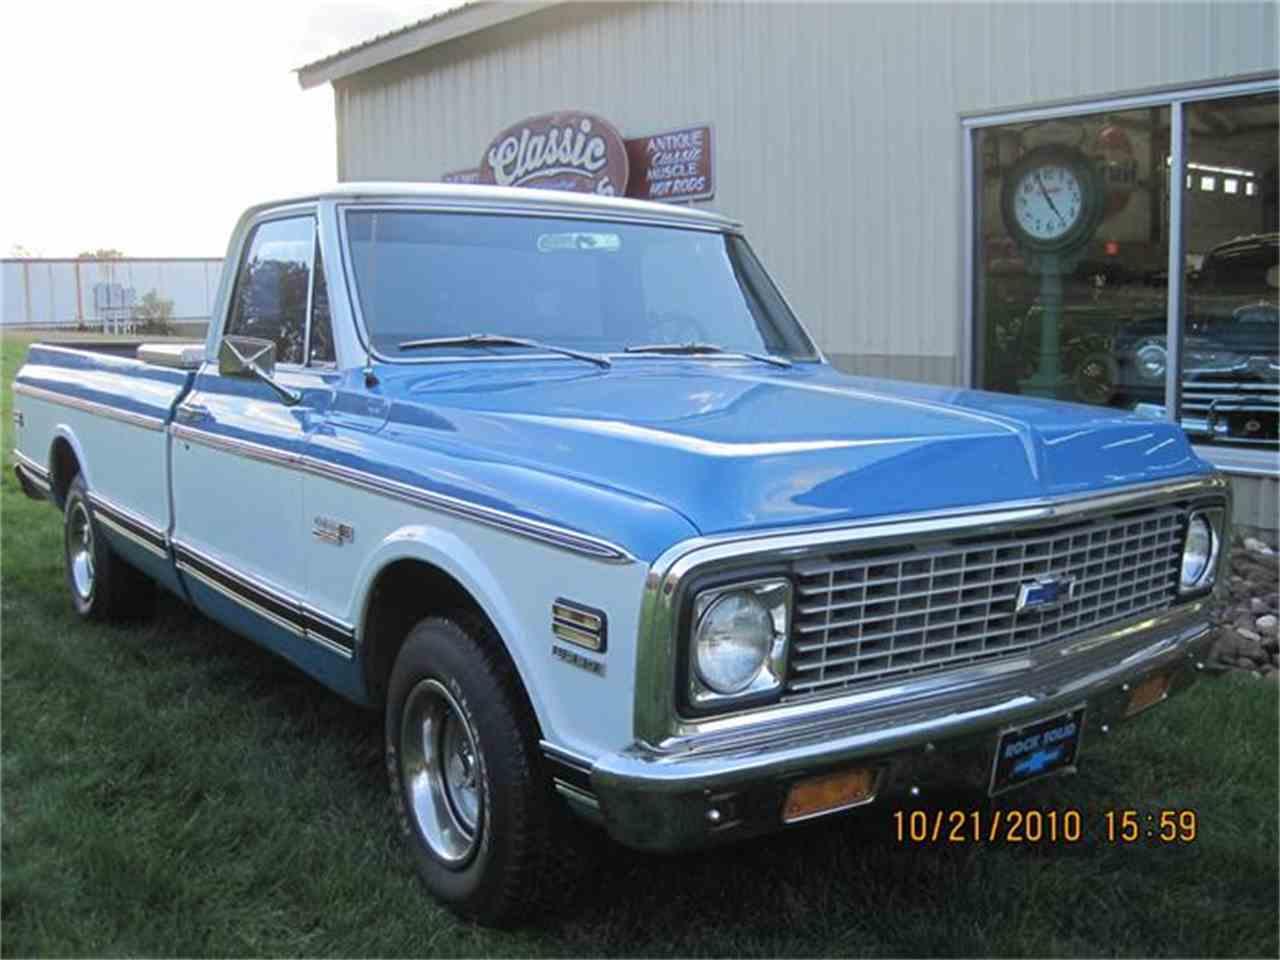 All Chevy 1972 chevrolet cheyenne super : 1972 Chevrolet Cheyenne for Sale   ClassicCars.com   CC-1027807